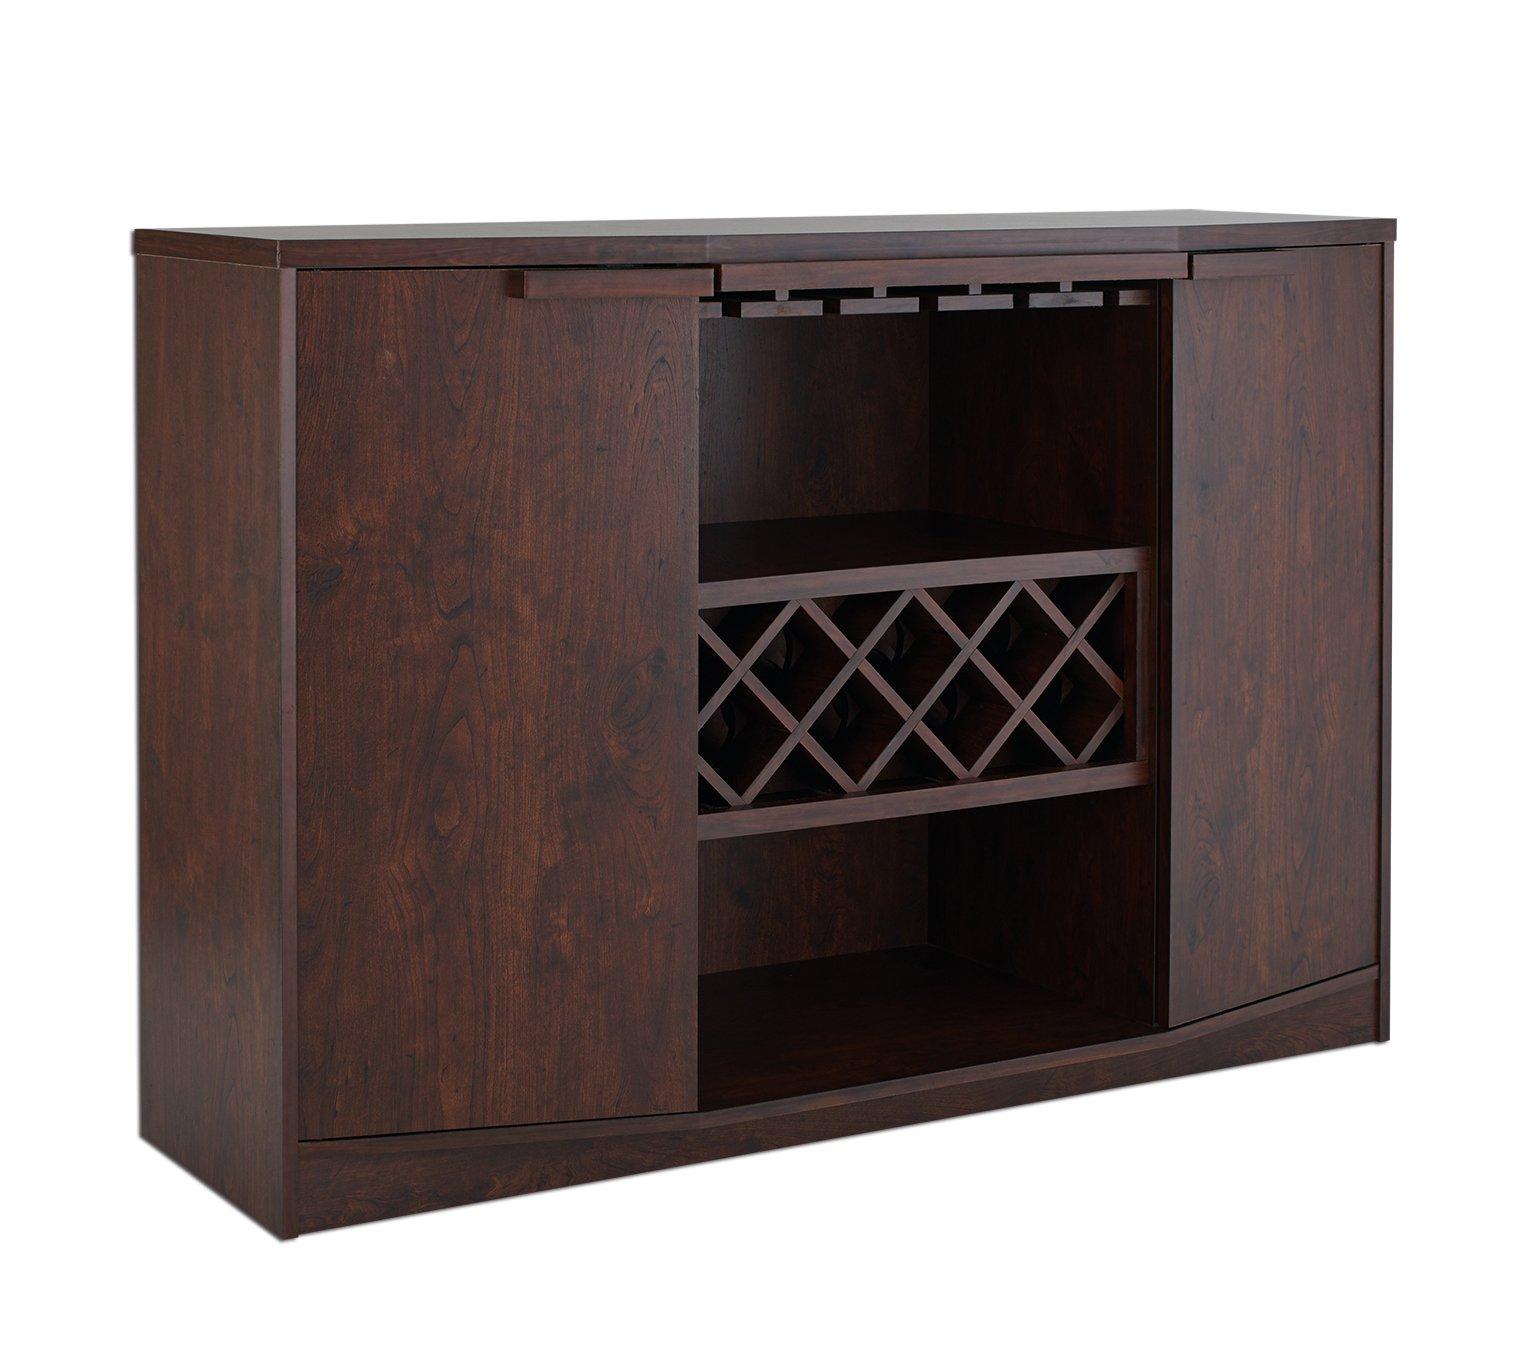 ioHOMES Annadel Wine Cabinet Buffet, Vintage Walnut